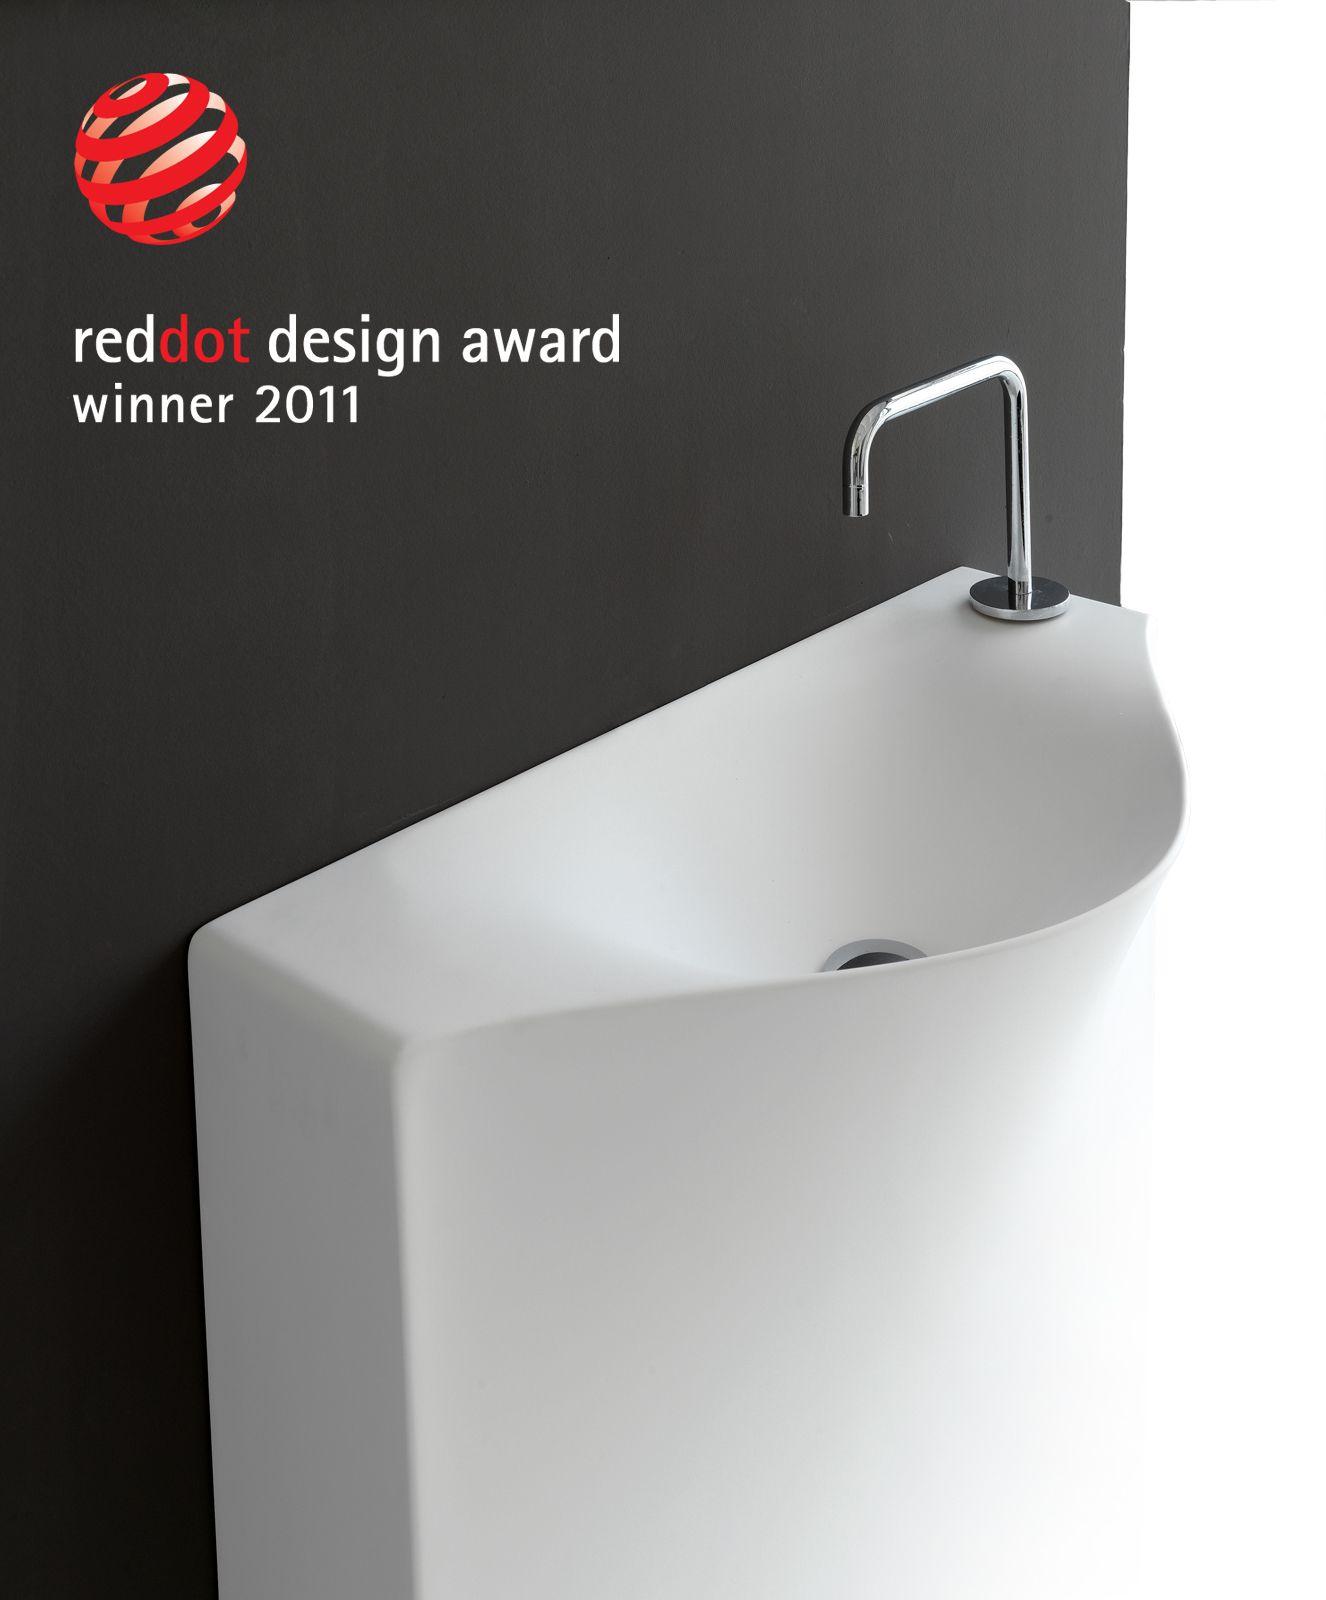 Ipad 2010 work red dot award product design - Red Dot Design Award Meneghello Paolelli Associati